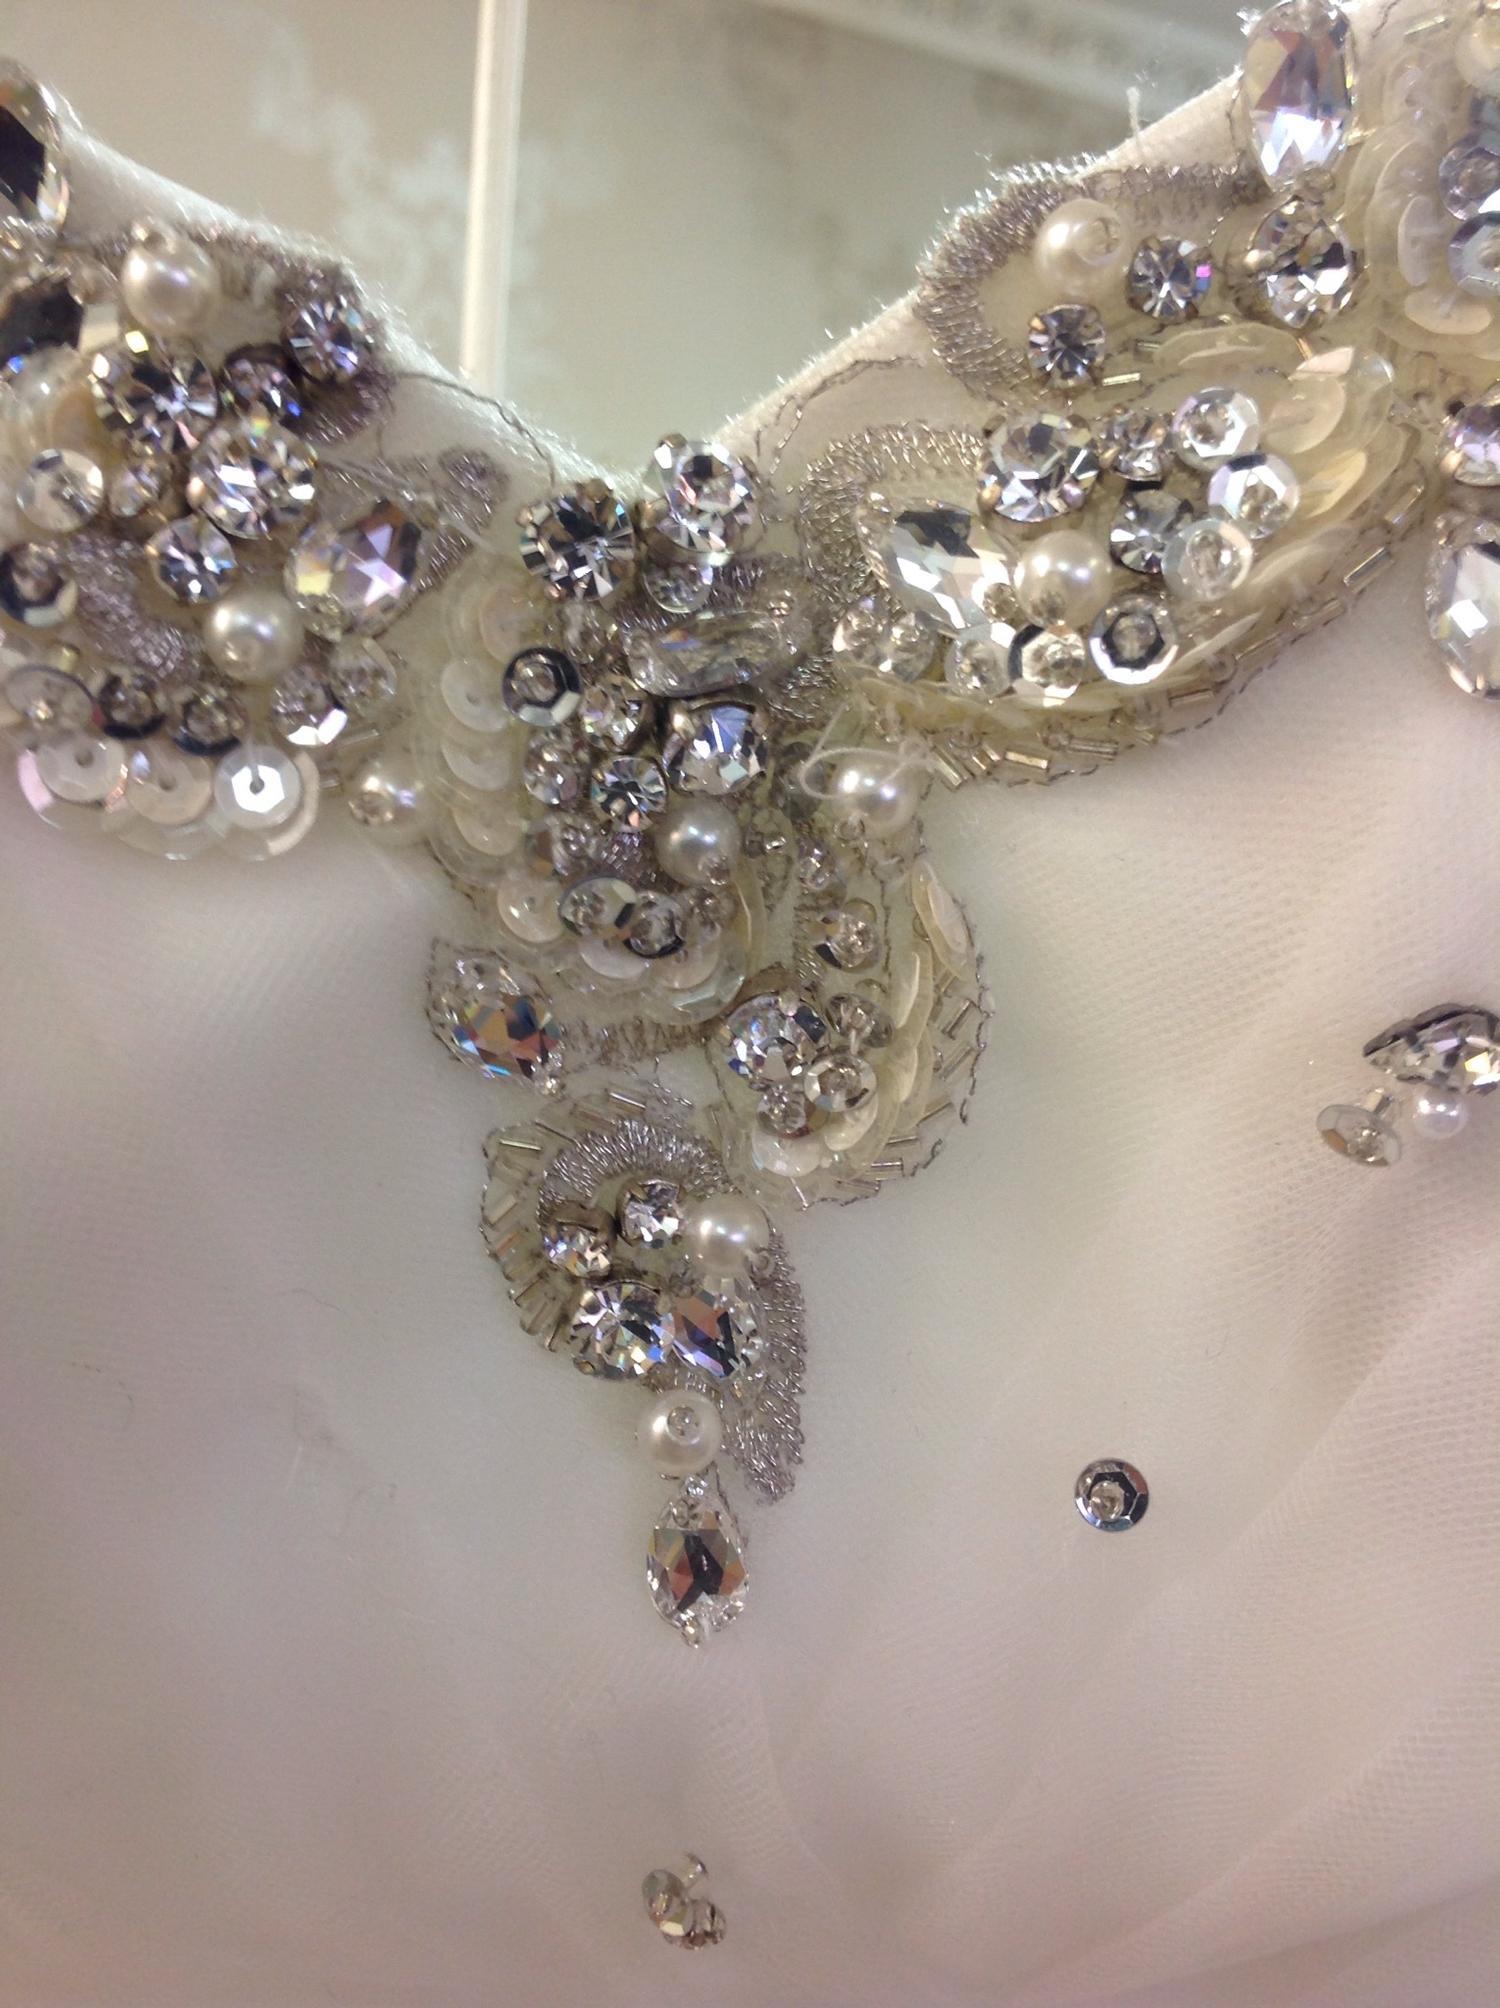 Lot 320 - (3) 4 x wedding gown samples, total rrp £3227, 3x Ronald Joyce, 1x MJ Bridal Fashions